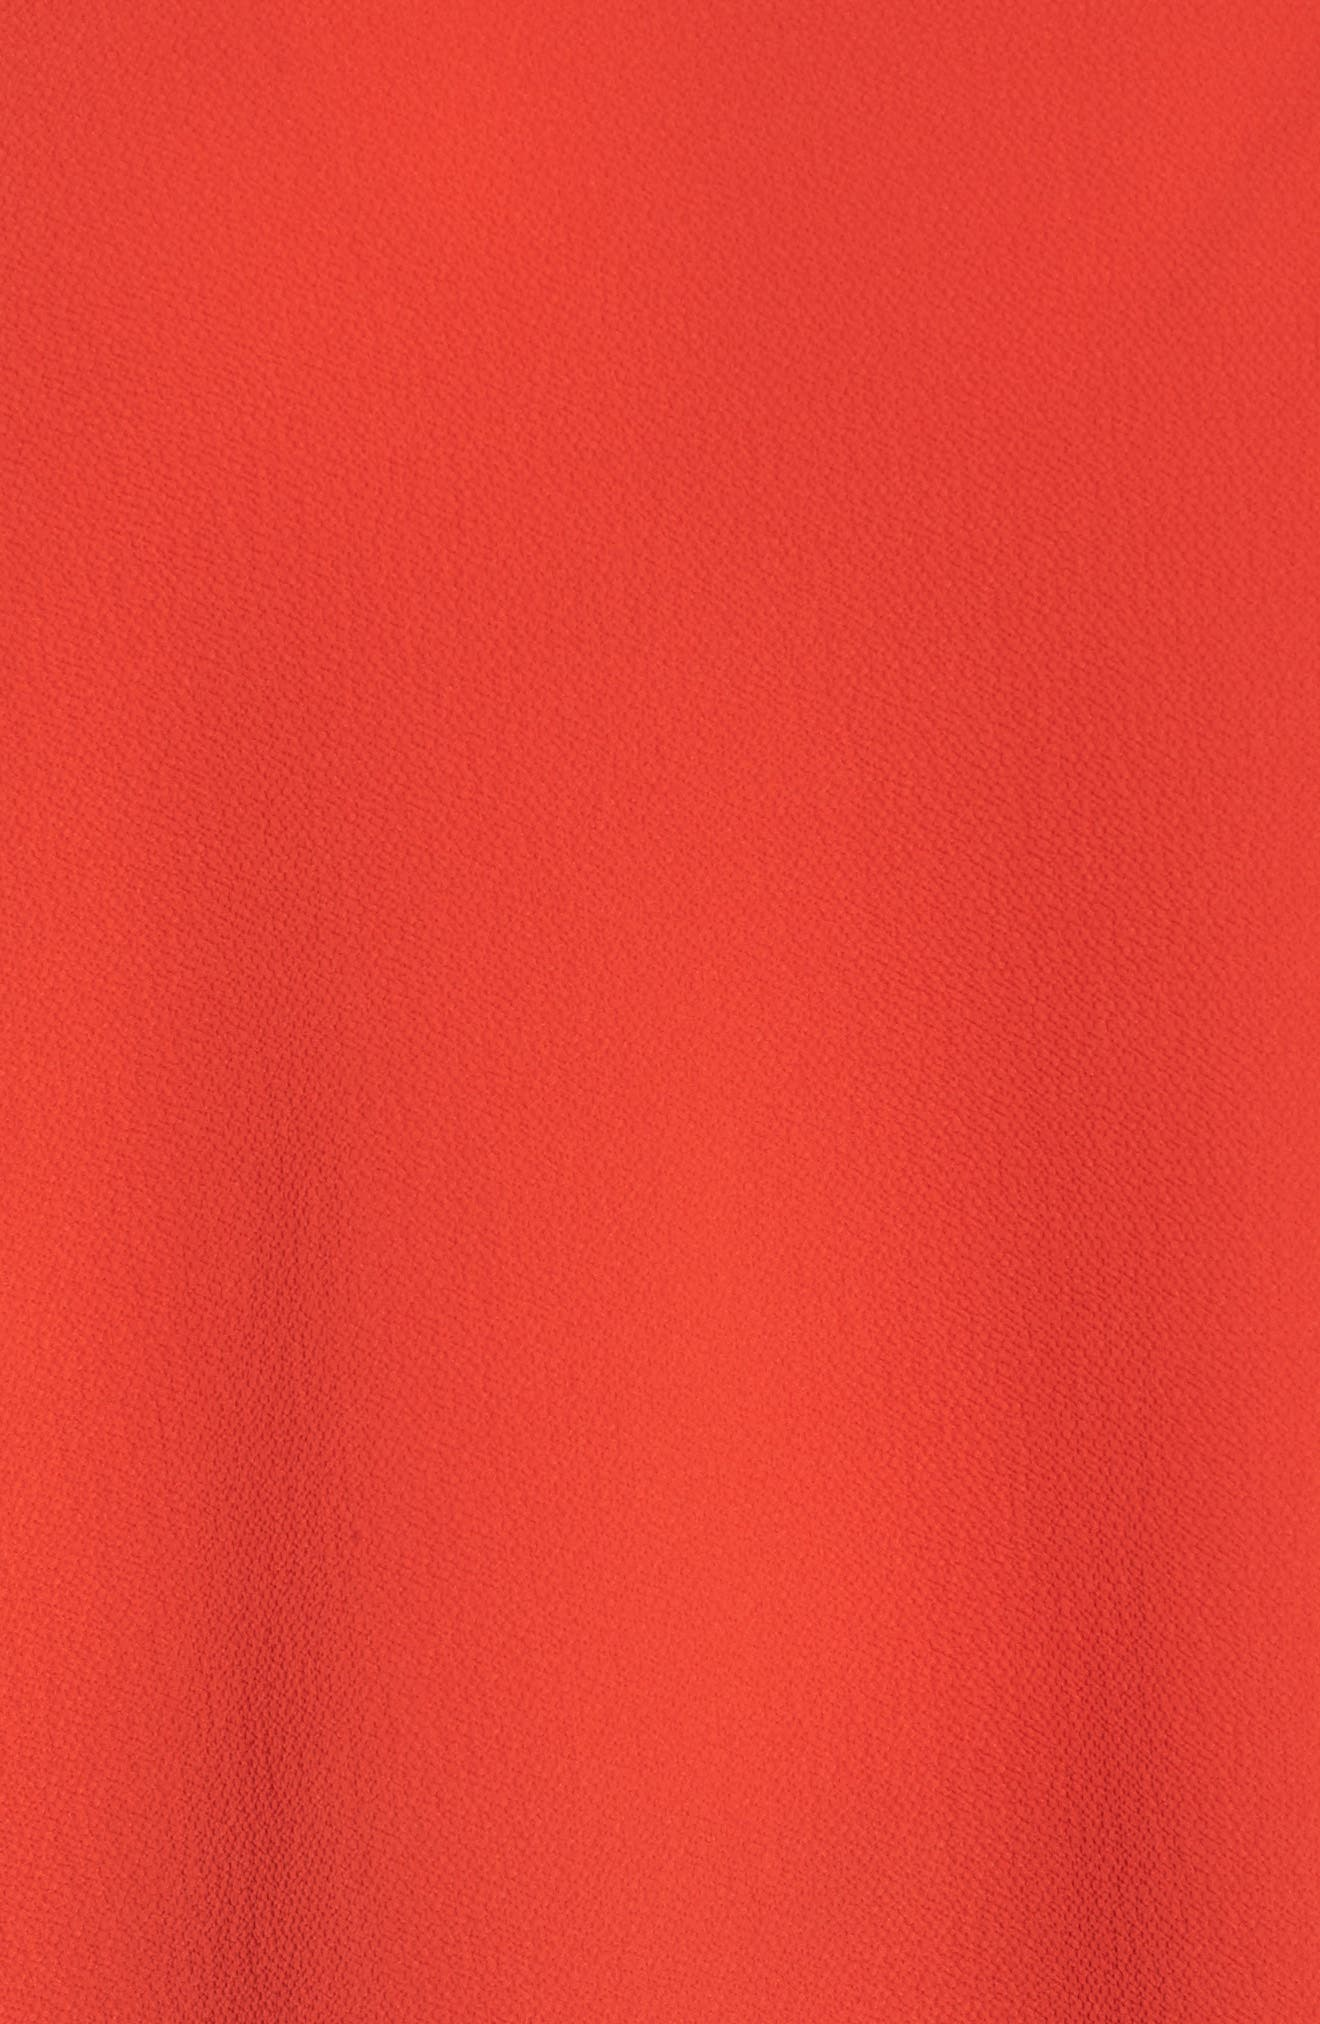 Tiered Ruffle Sleeve Top,                             Alternate thumbnail 5, color,                             Geranium